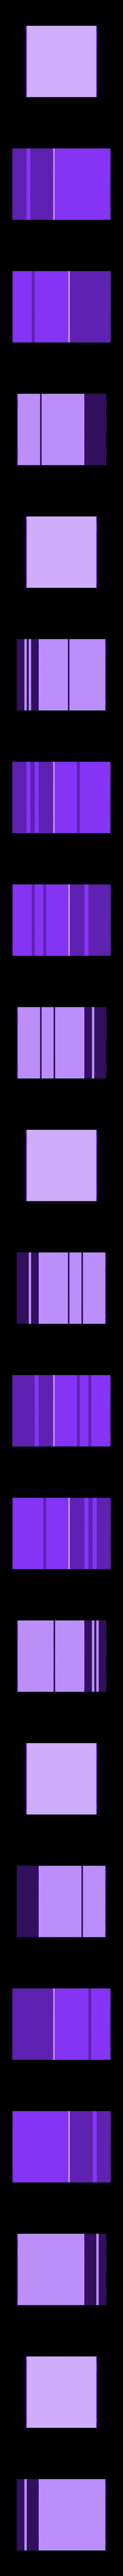 Body1.stl Download STL file Square it! • 3D printer template, Log5